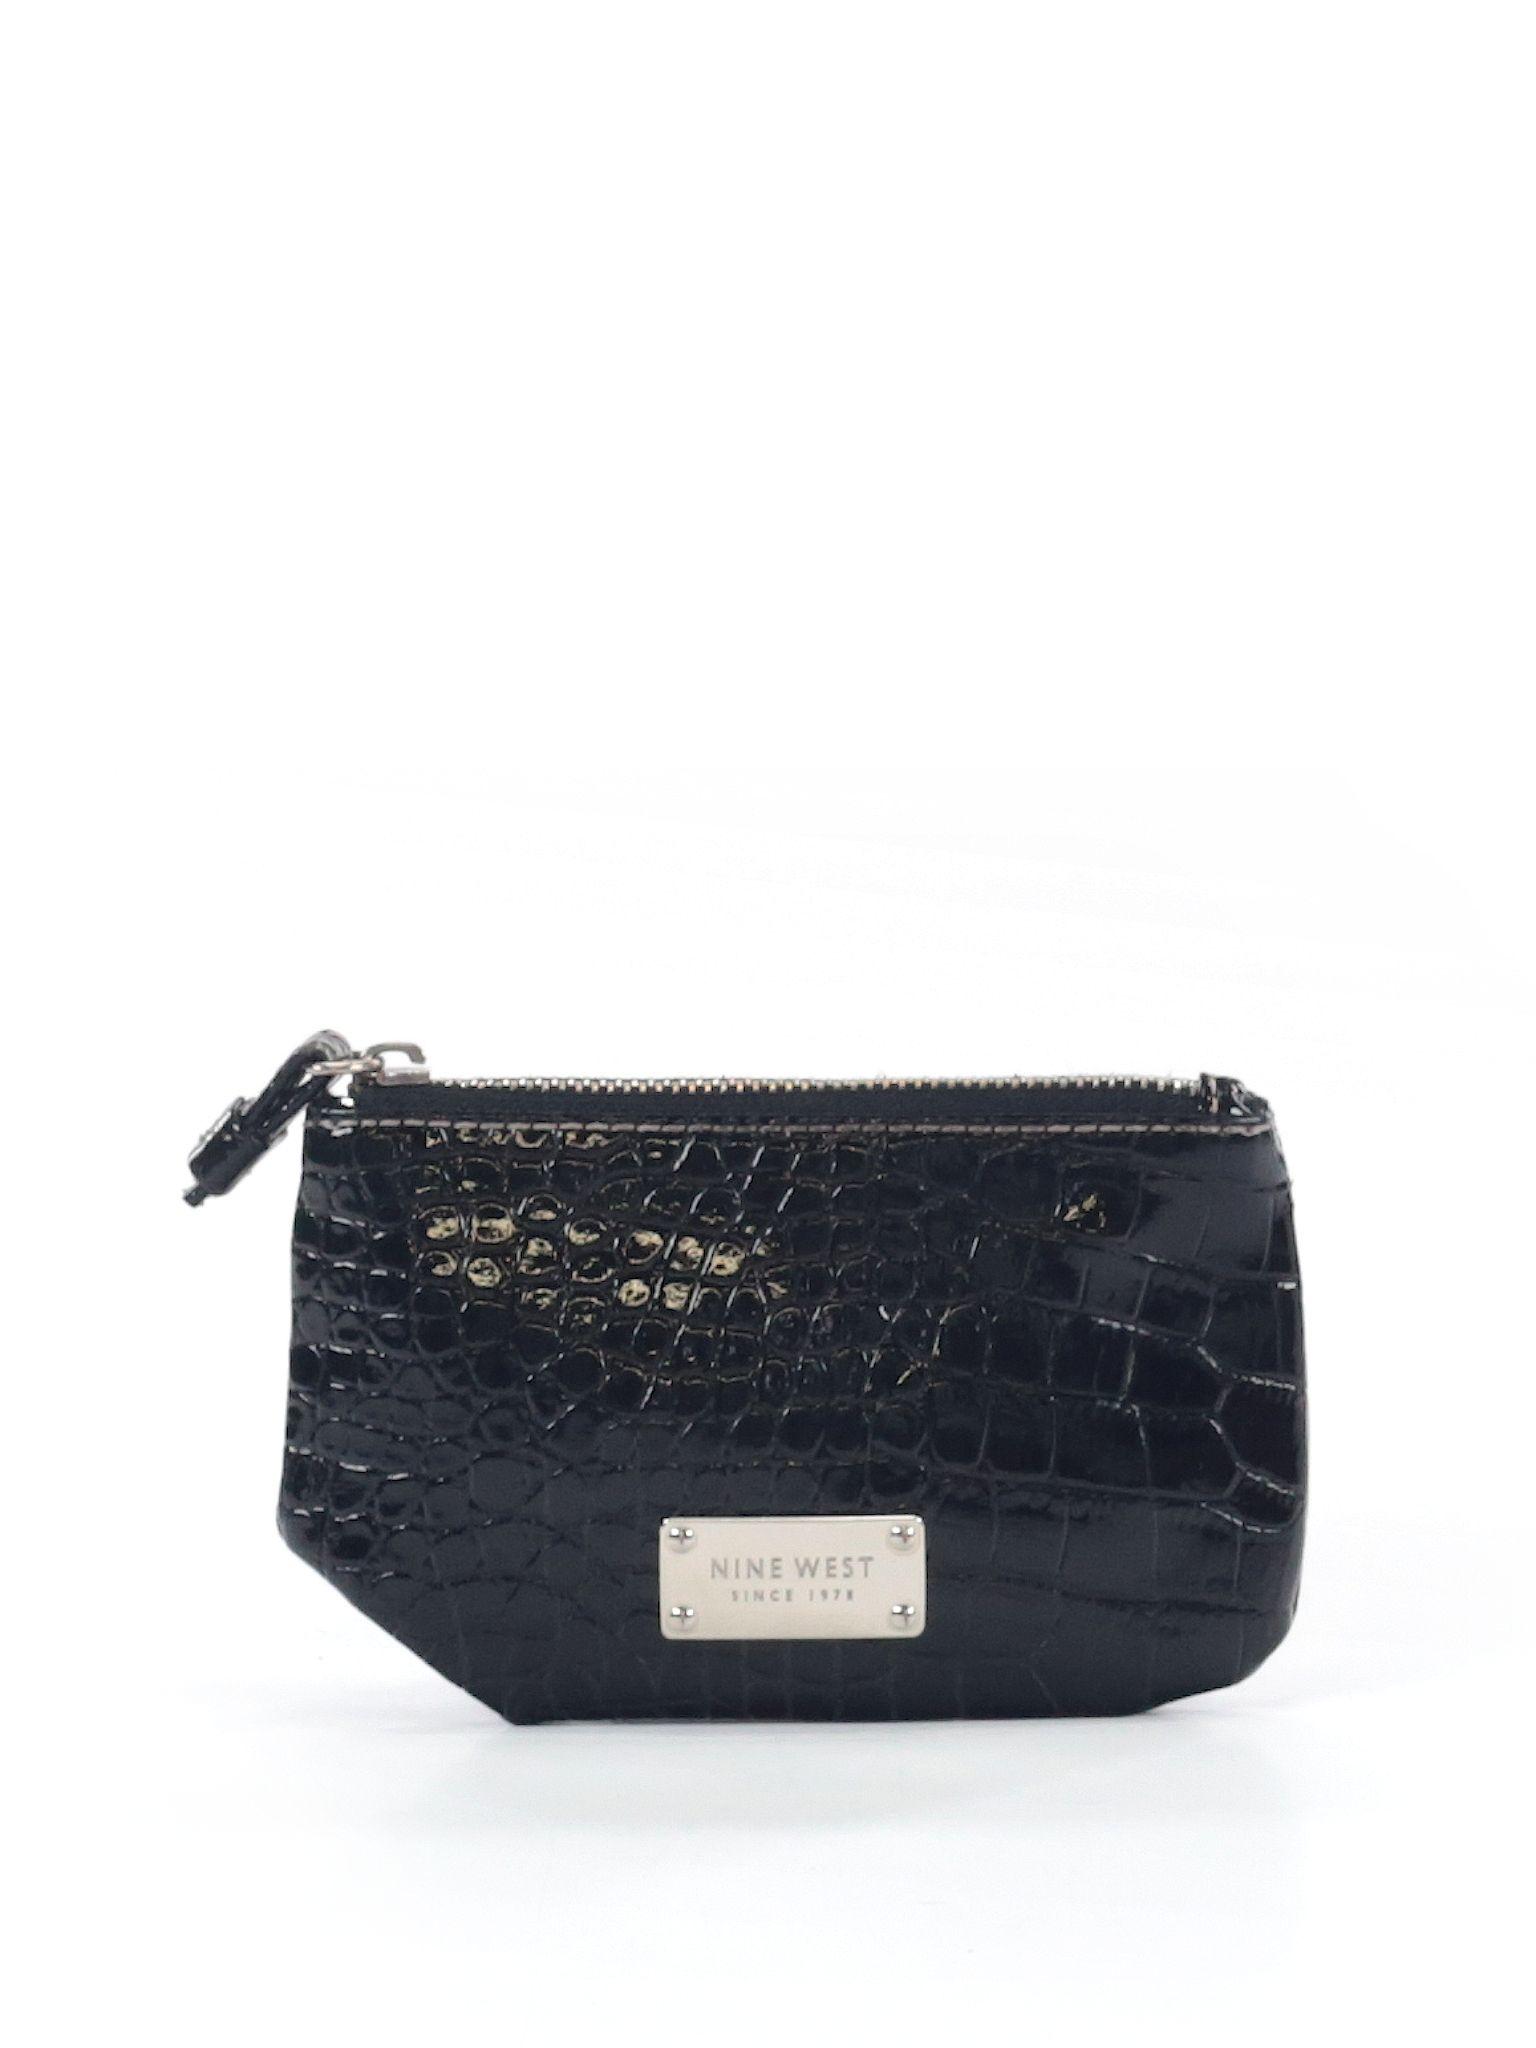 Nine West Clutch Size Na Black Womens Bags  $2499